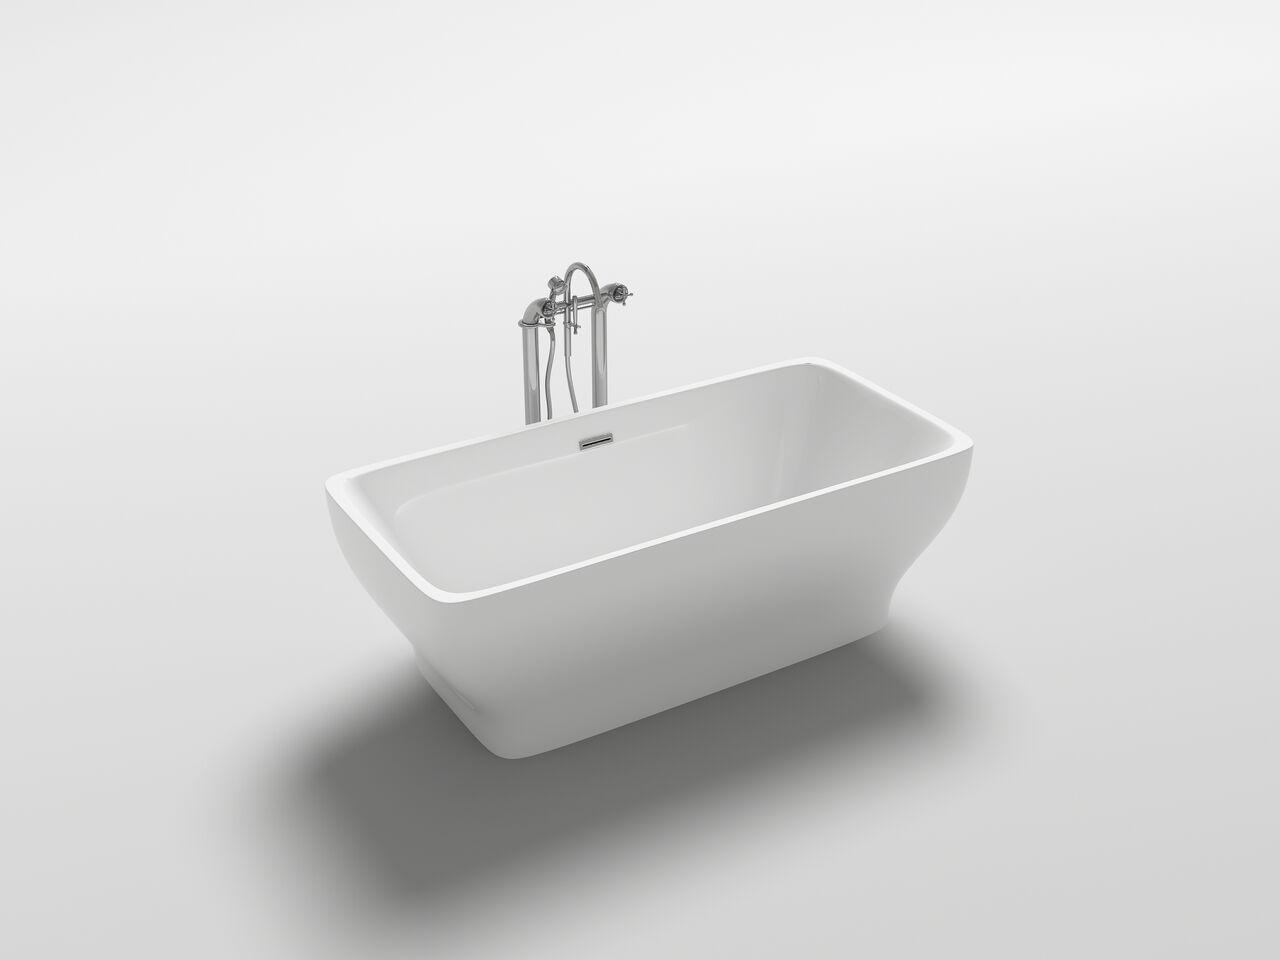 freistehende badewanne wanne design acrylwanne freistehend 1700 x 800 x 580mm co. Black Bedroom Furniture Sets. Home Design Ideas